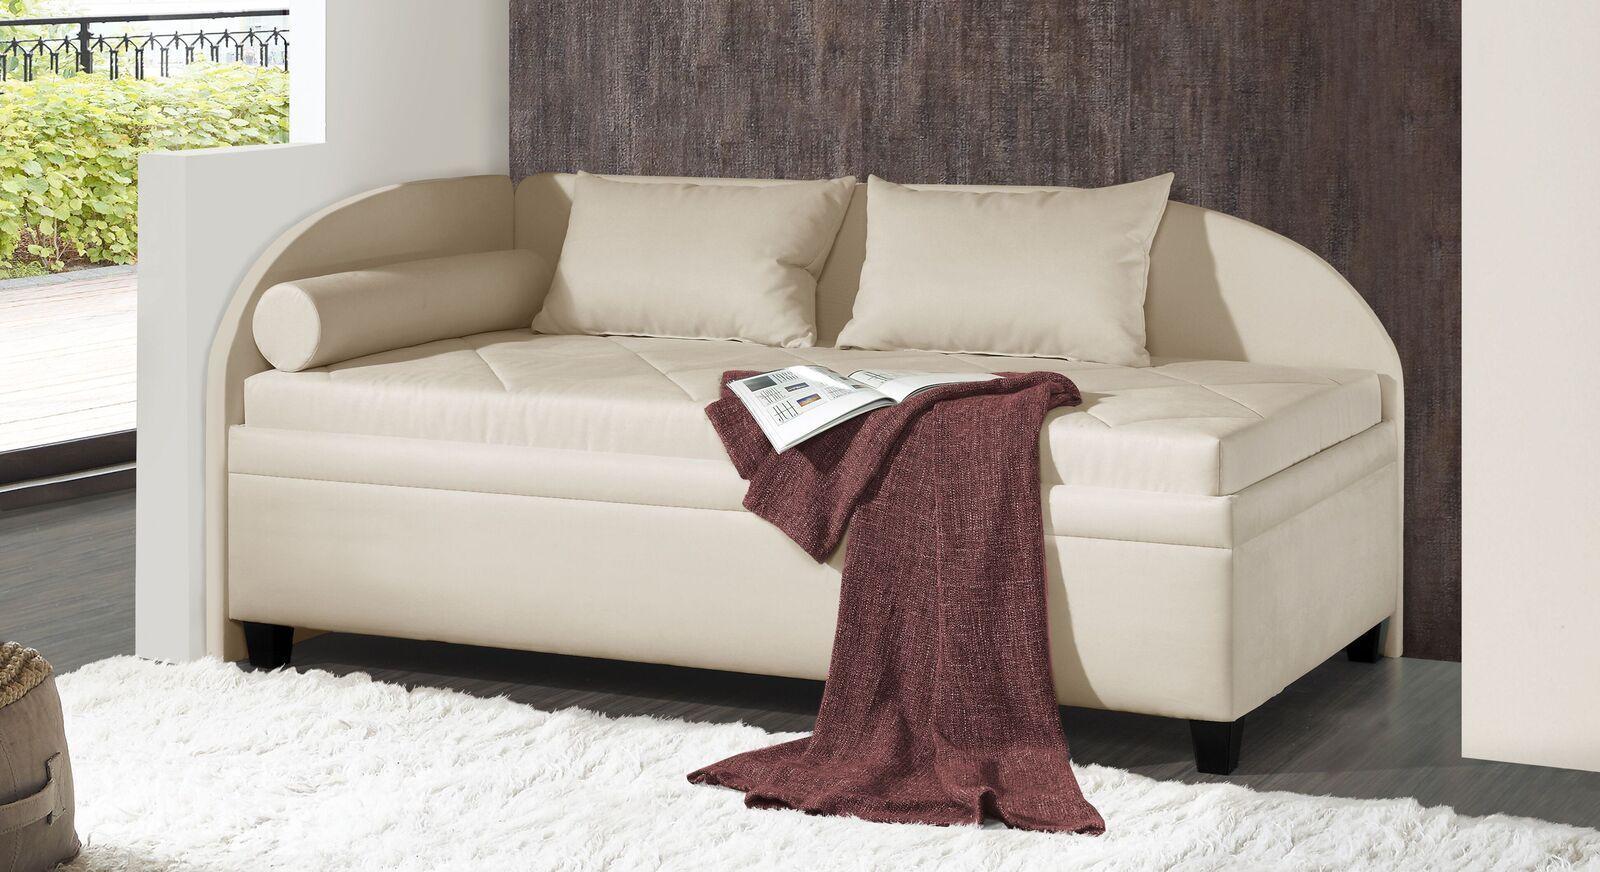 Studioliege Kamina Komfort   Sofa bed, Study sofas, Studio bed